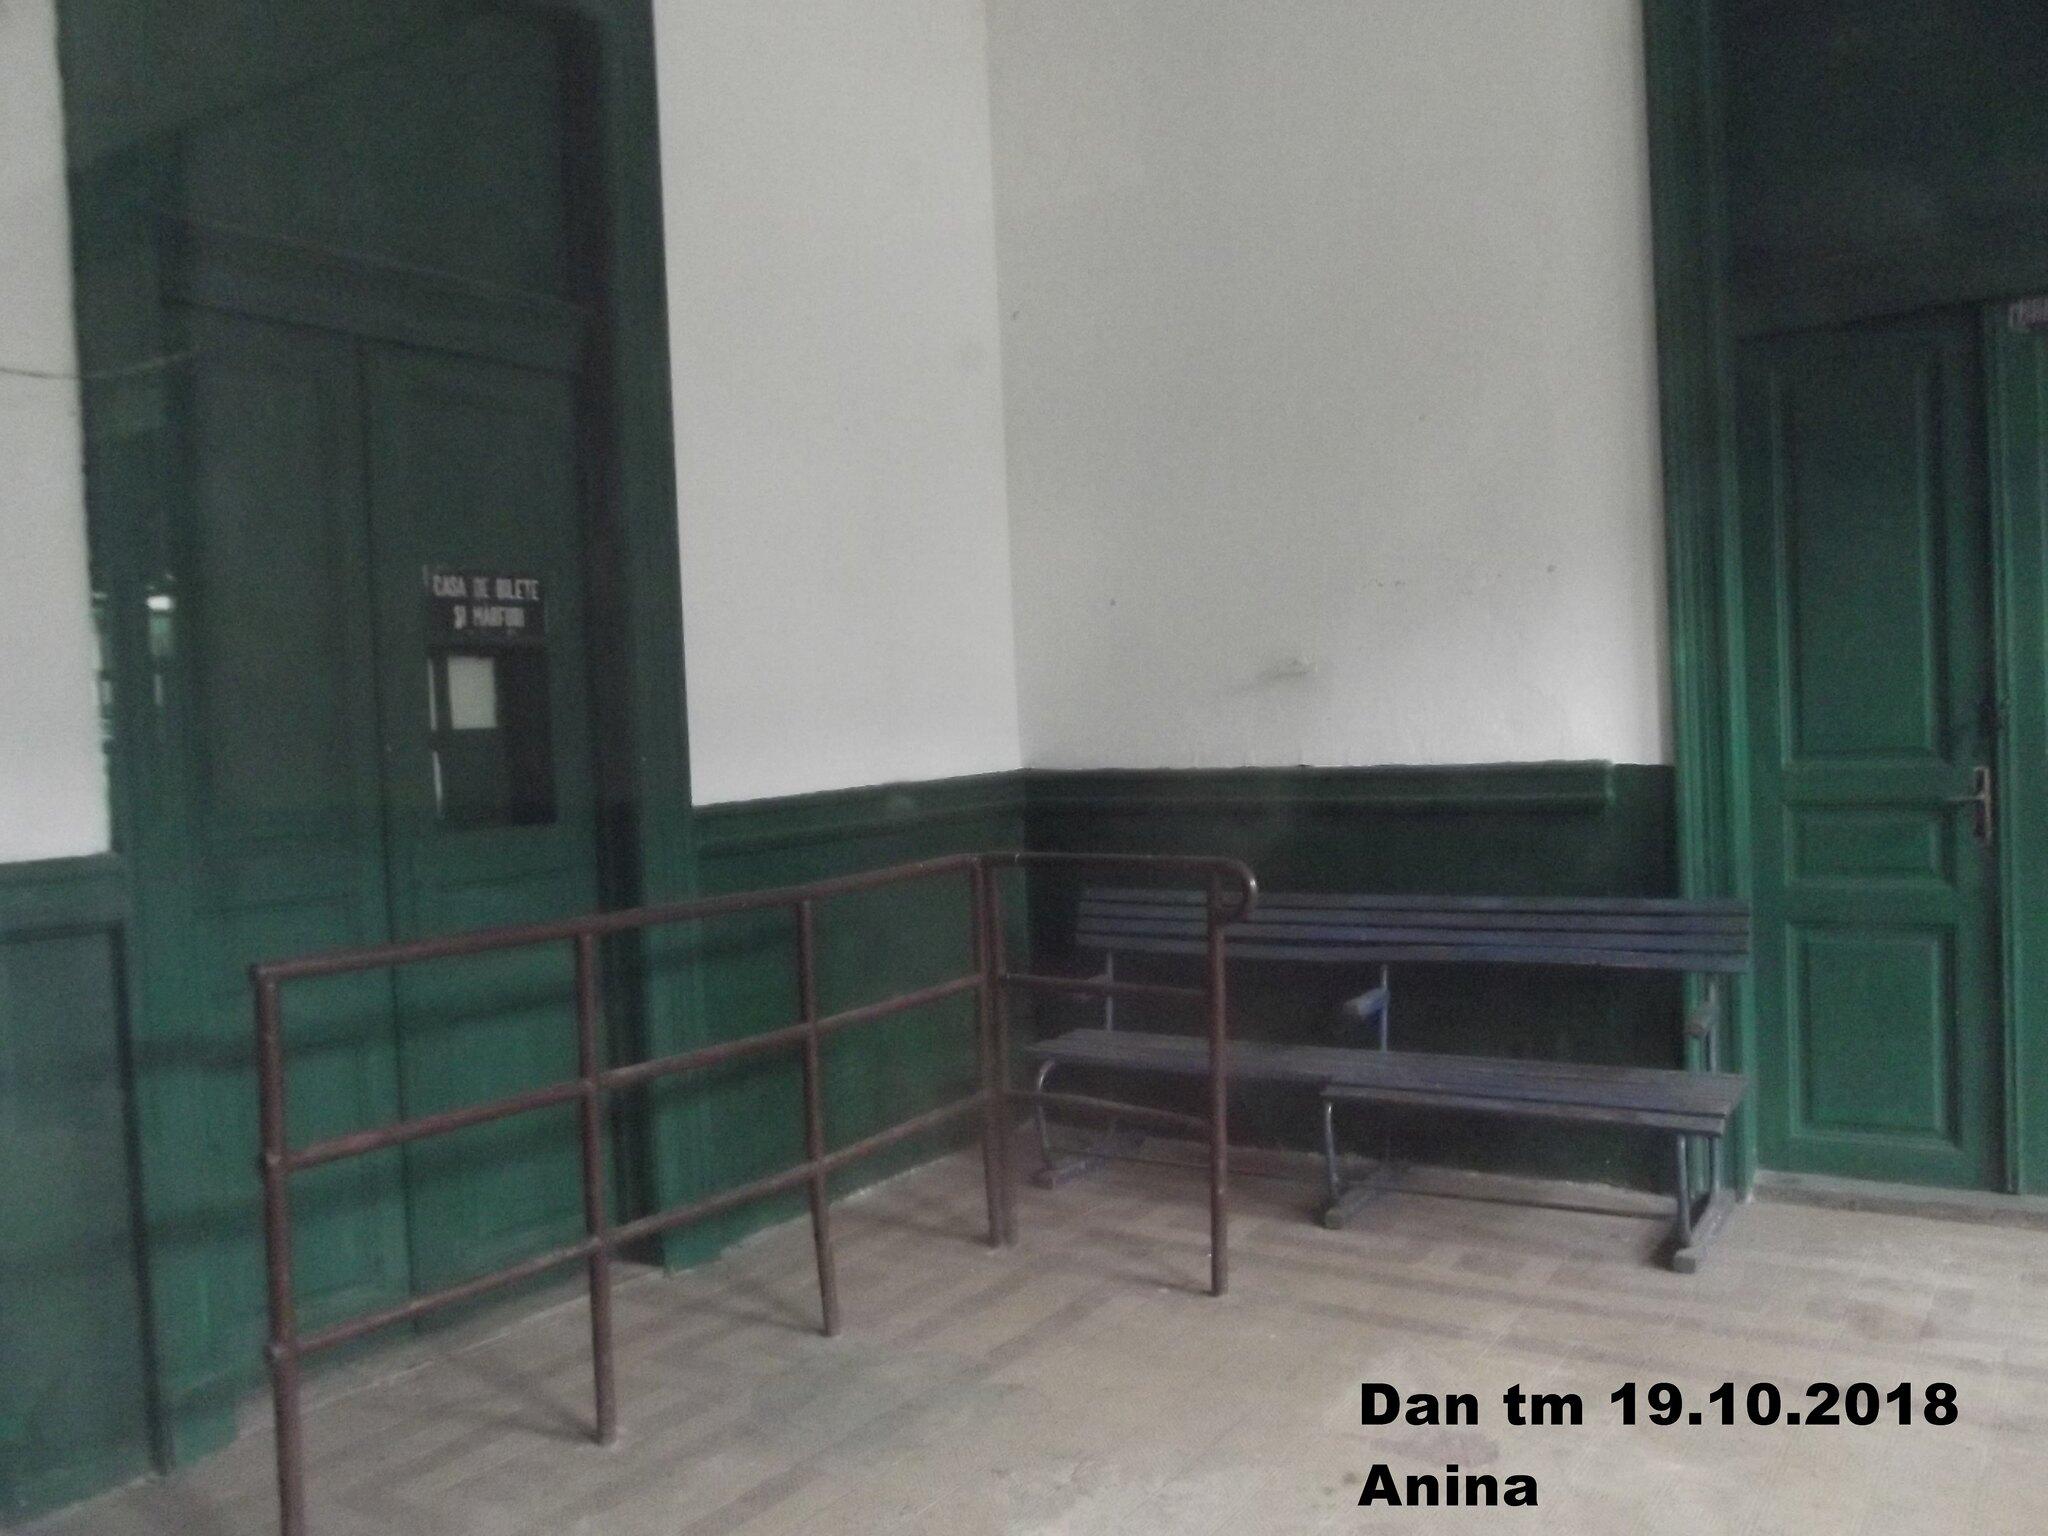 925 : Oravita - Anina - Pagina 40 31596365088_9372ae19e8_k